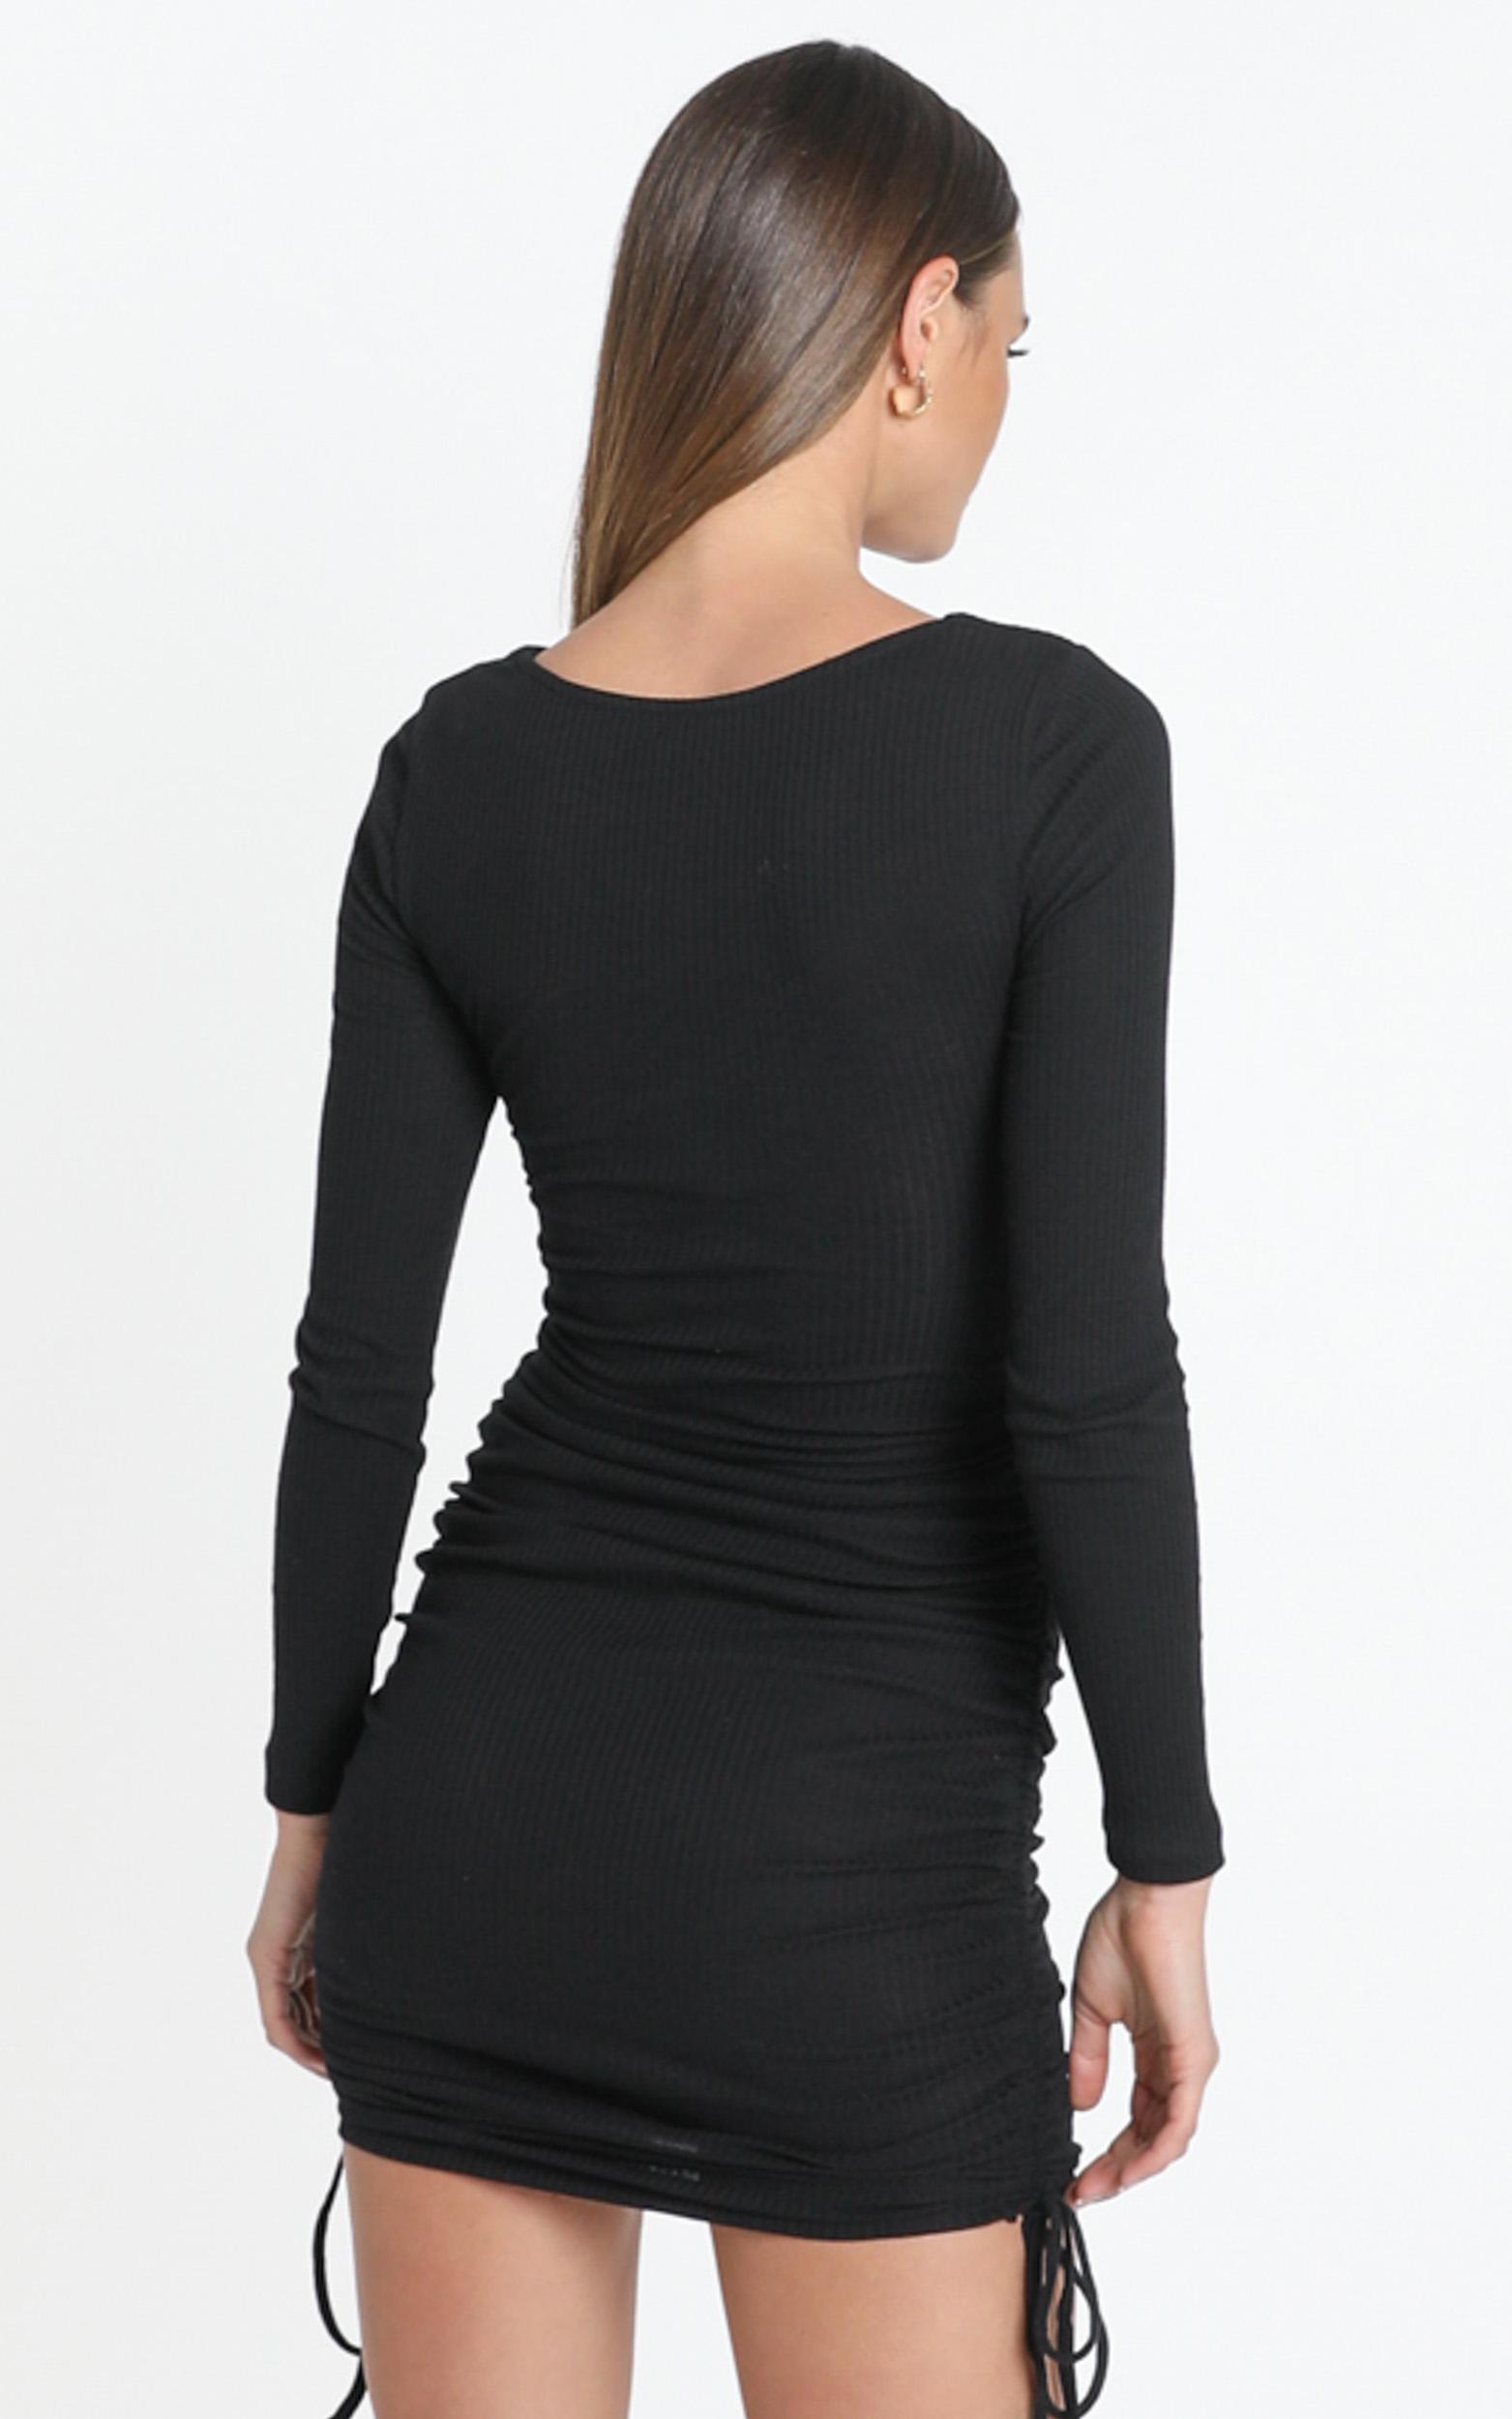 Naiya Dress in Black - 12 (L), Black, hi-res image number null